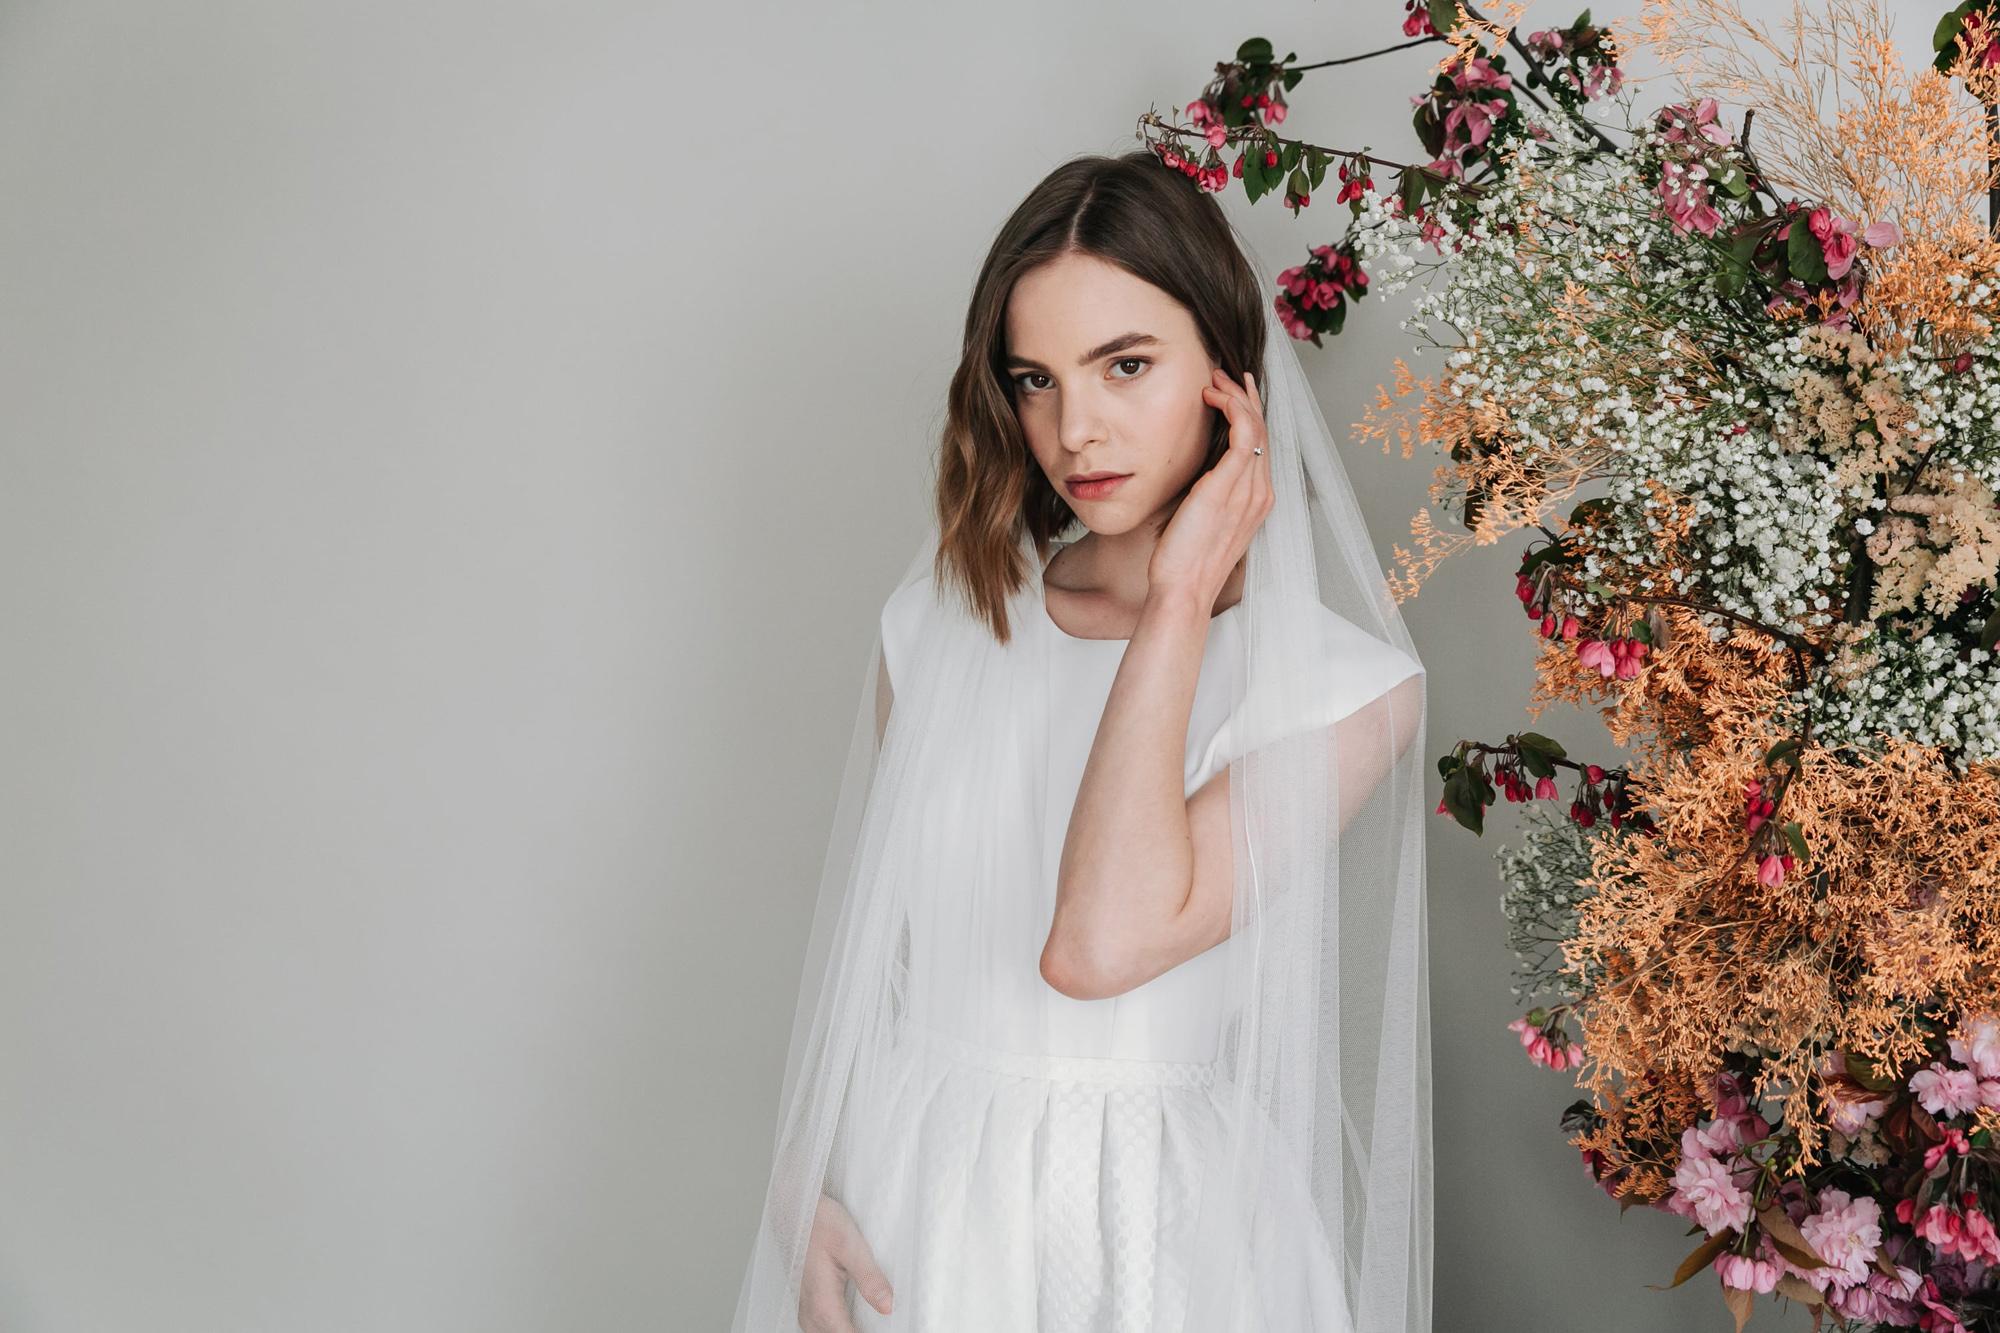 Kate-Beaumont-Sheffield-Zinnia-Modern-Wedding-Gown-Polka-Dot-Pleated-Skirt-18.jpg